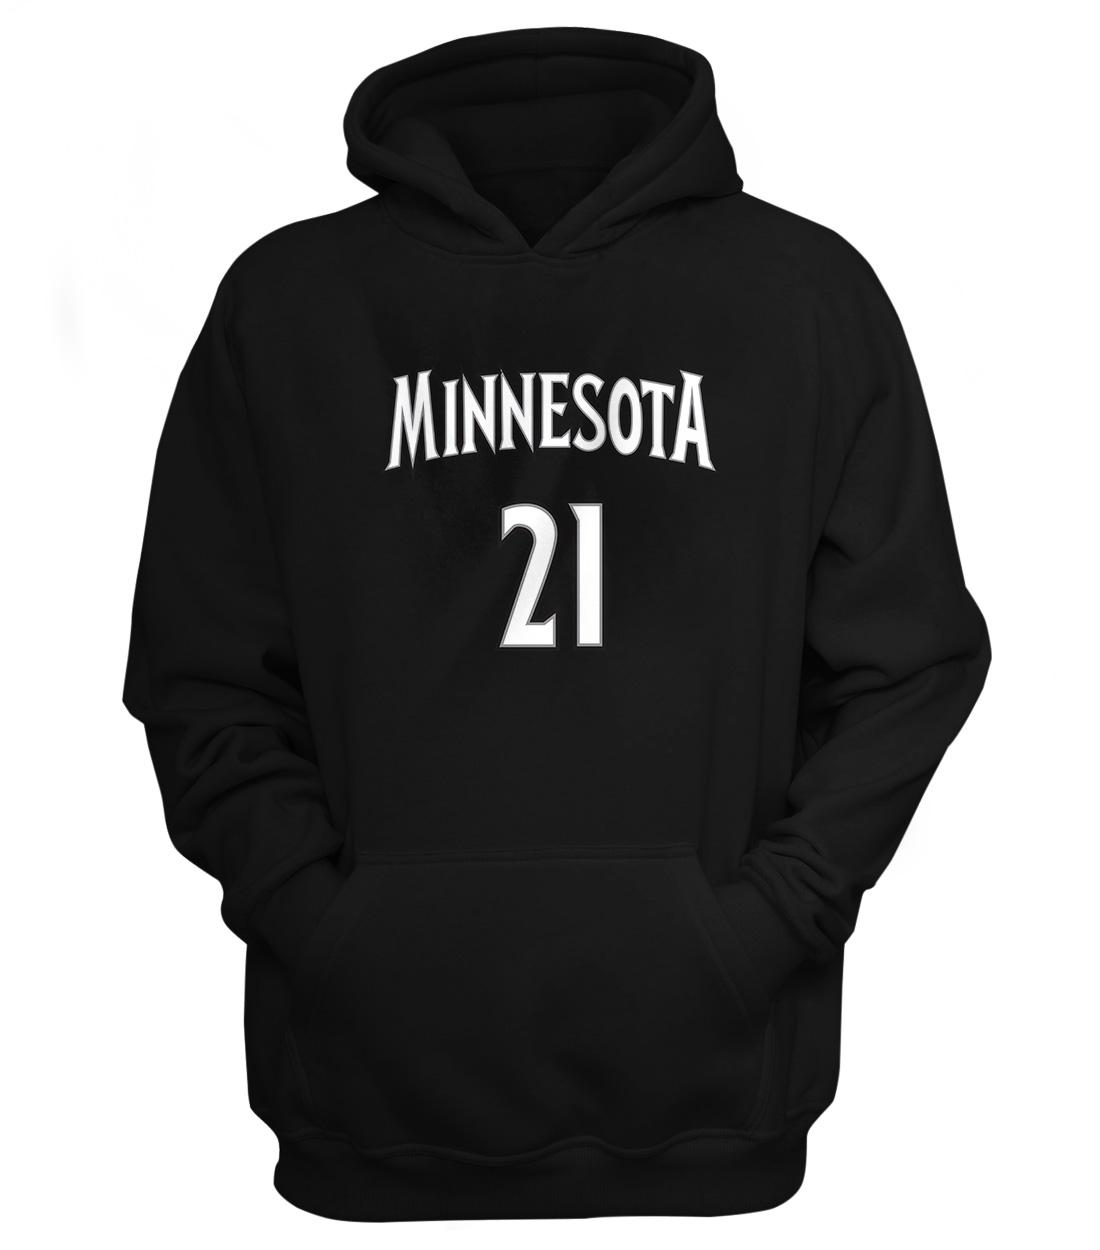 Minnesota Timberwolves Minnesota Kevin Garnett Hoodie (HD-BLC-180-PLYR-MIN-GARNETT.FRM)